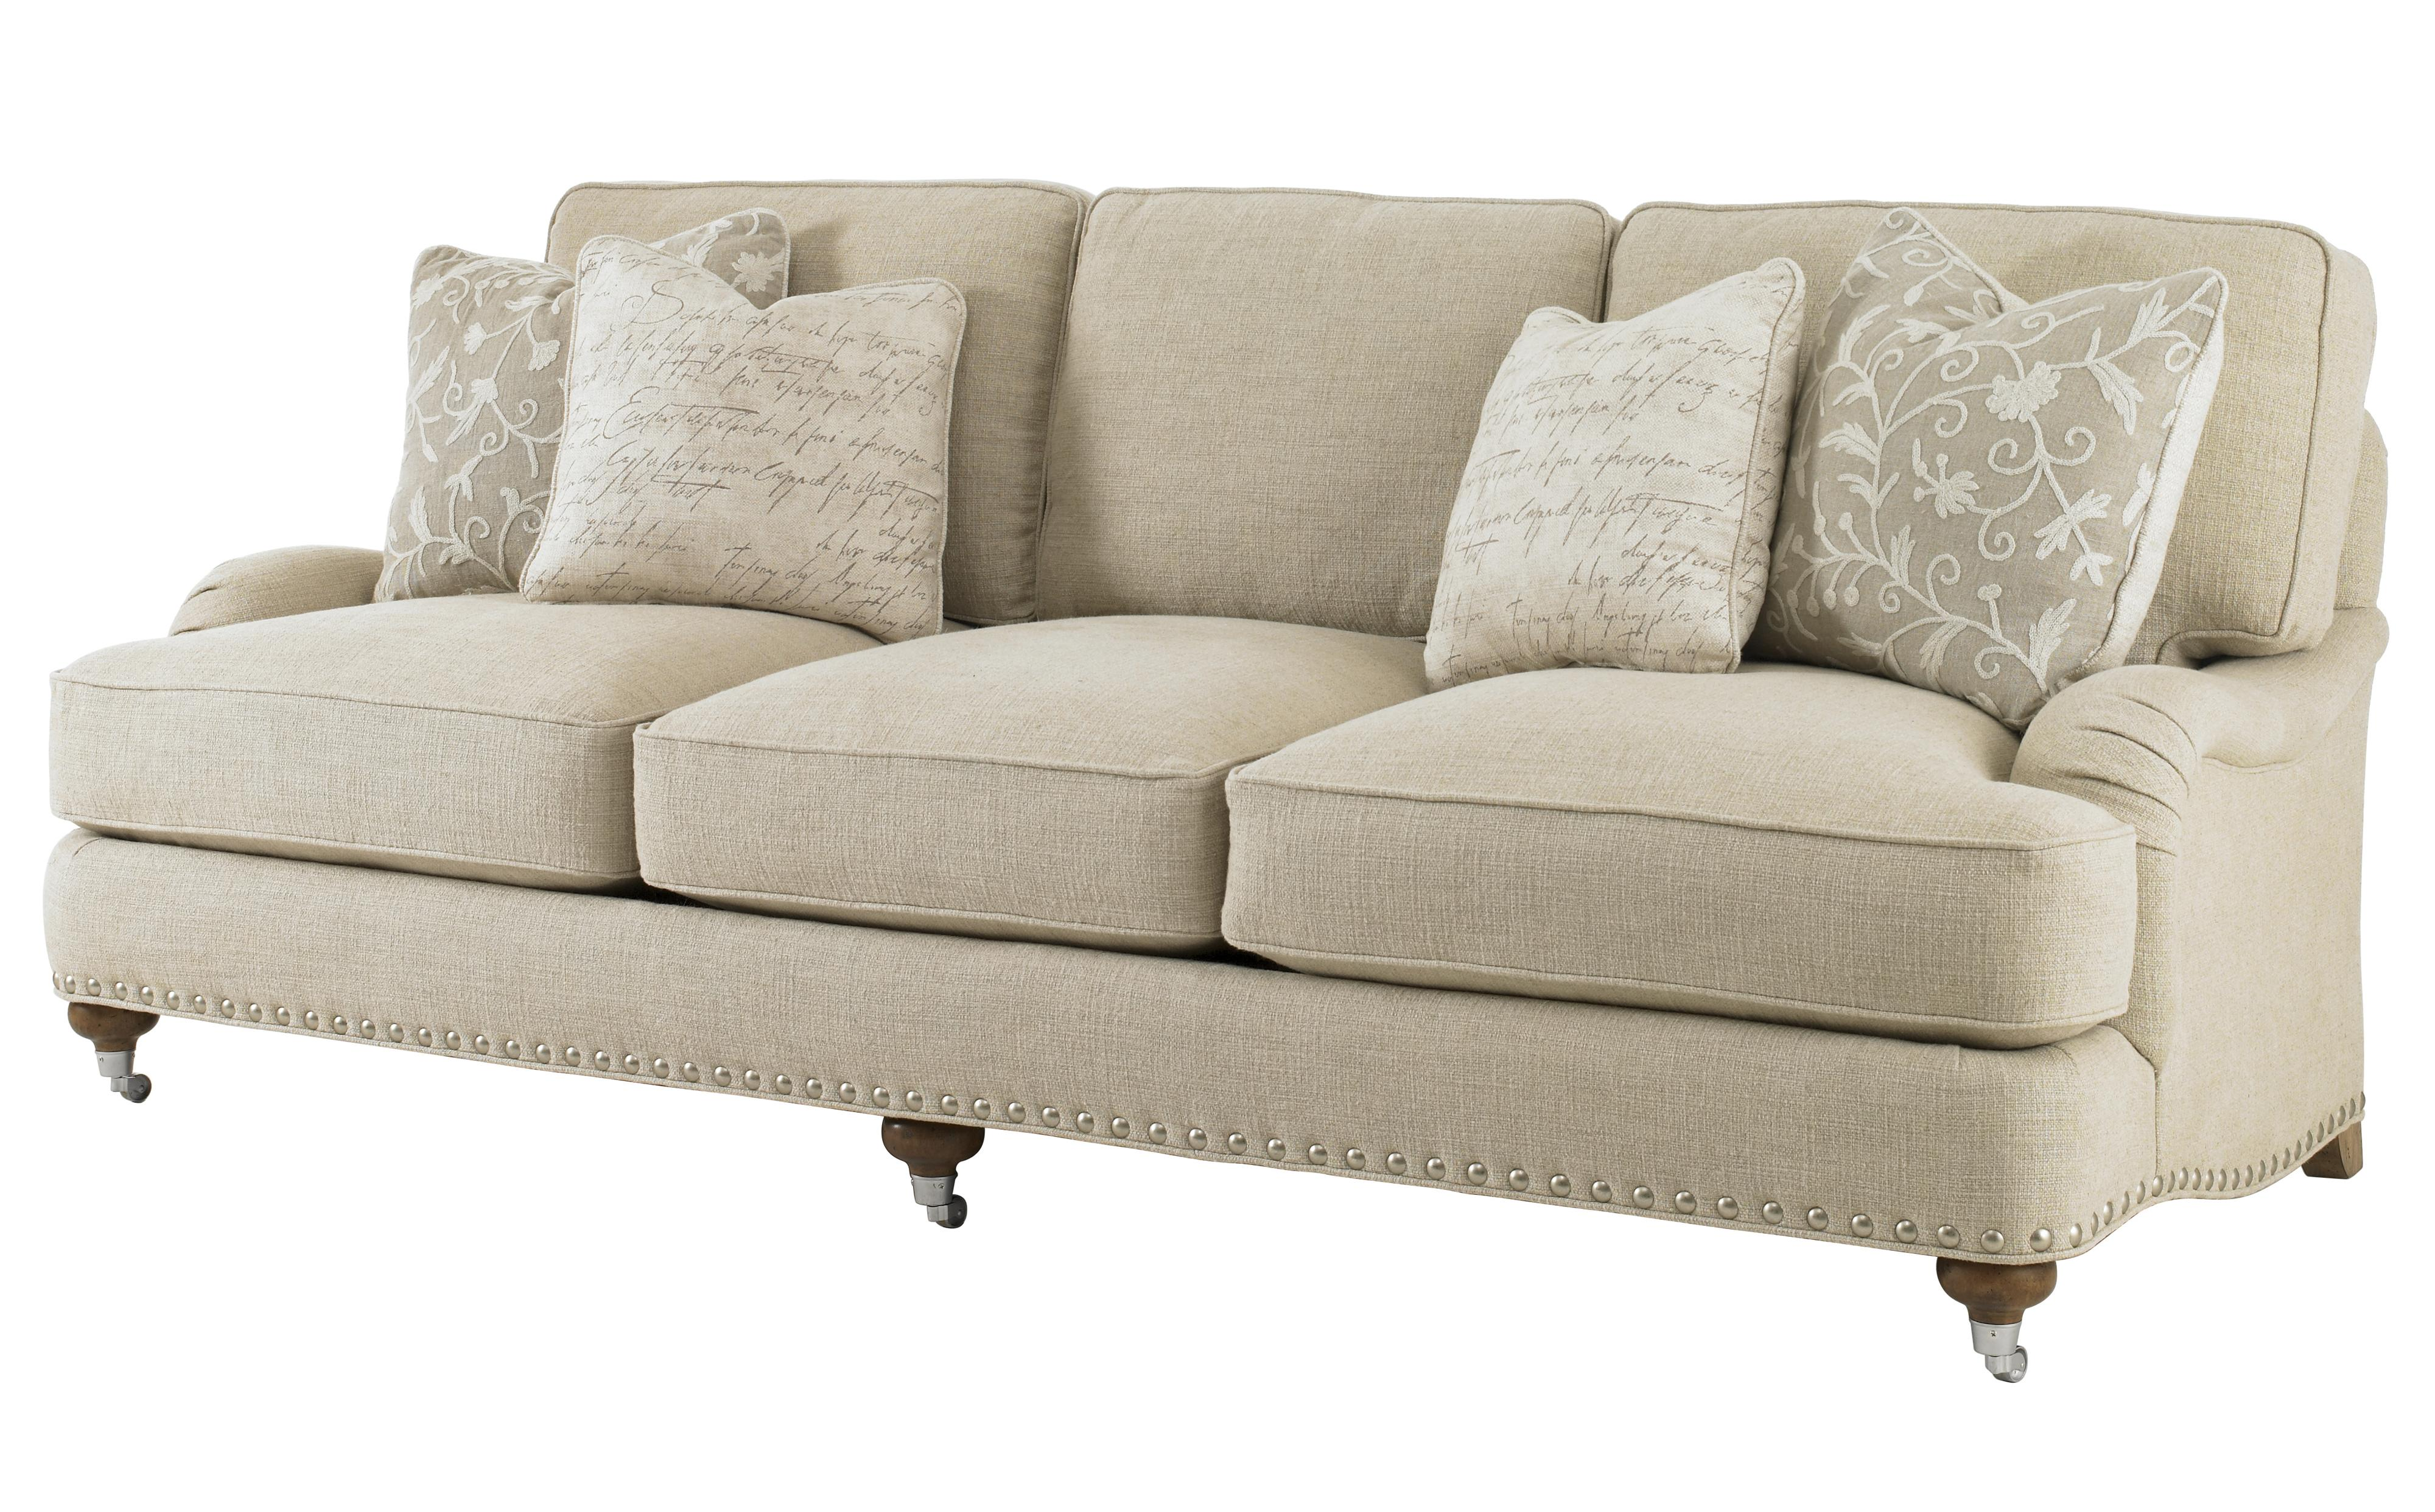 Twilight Bay Carley Sofa by Lexington at Baer's Furniture